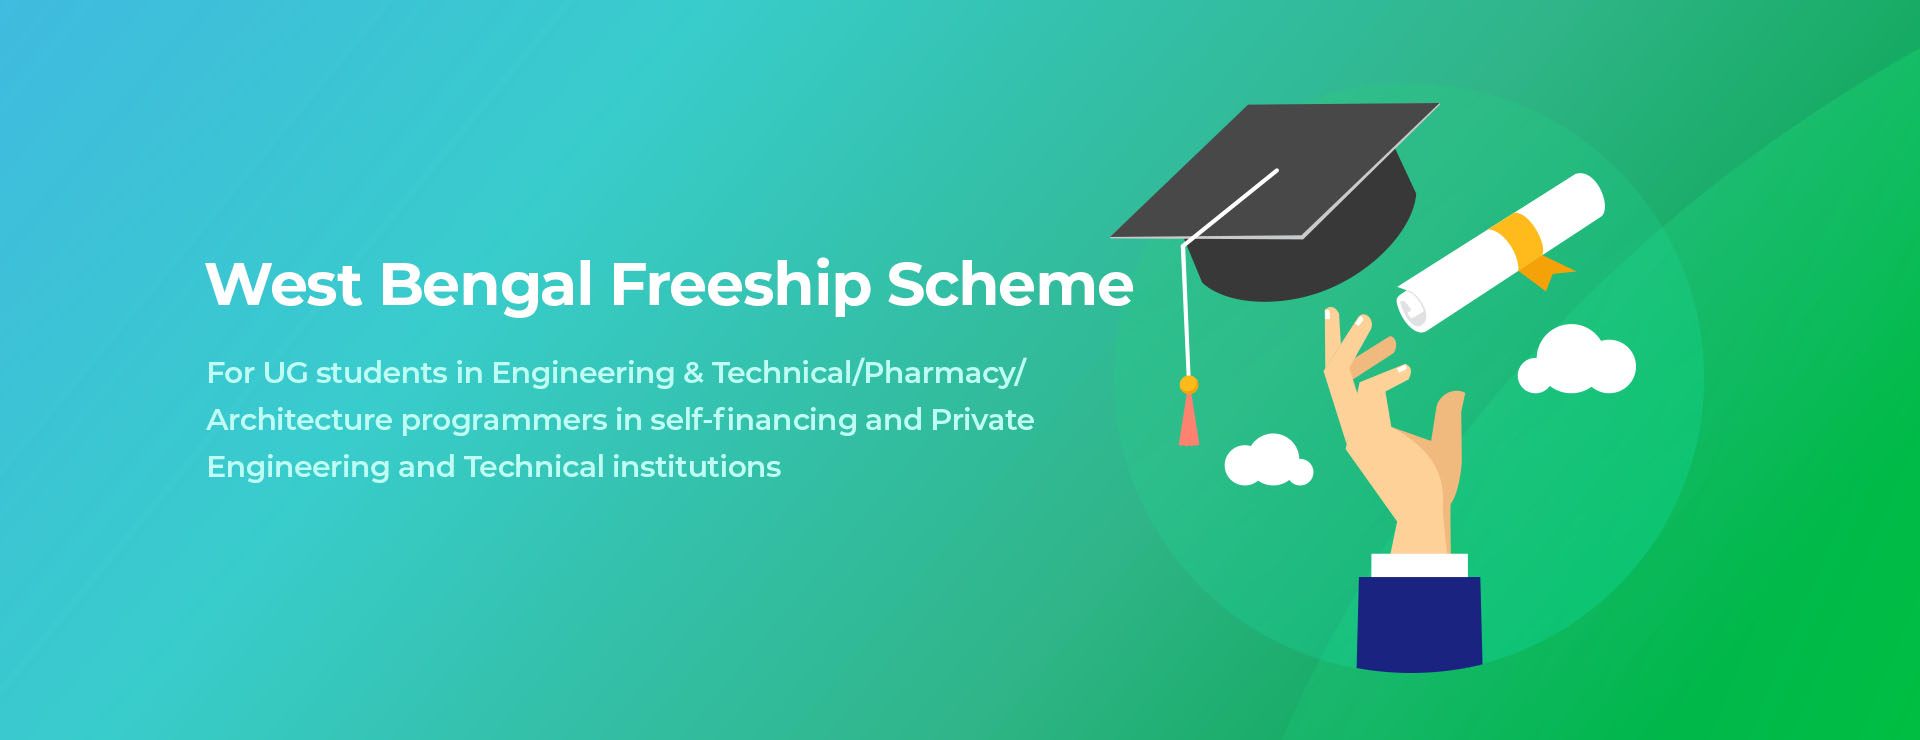 West Bengal Freeship Scheme